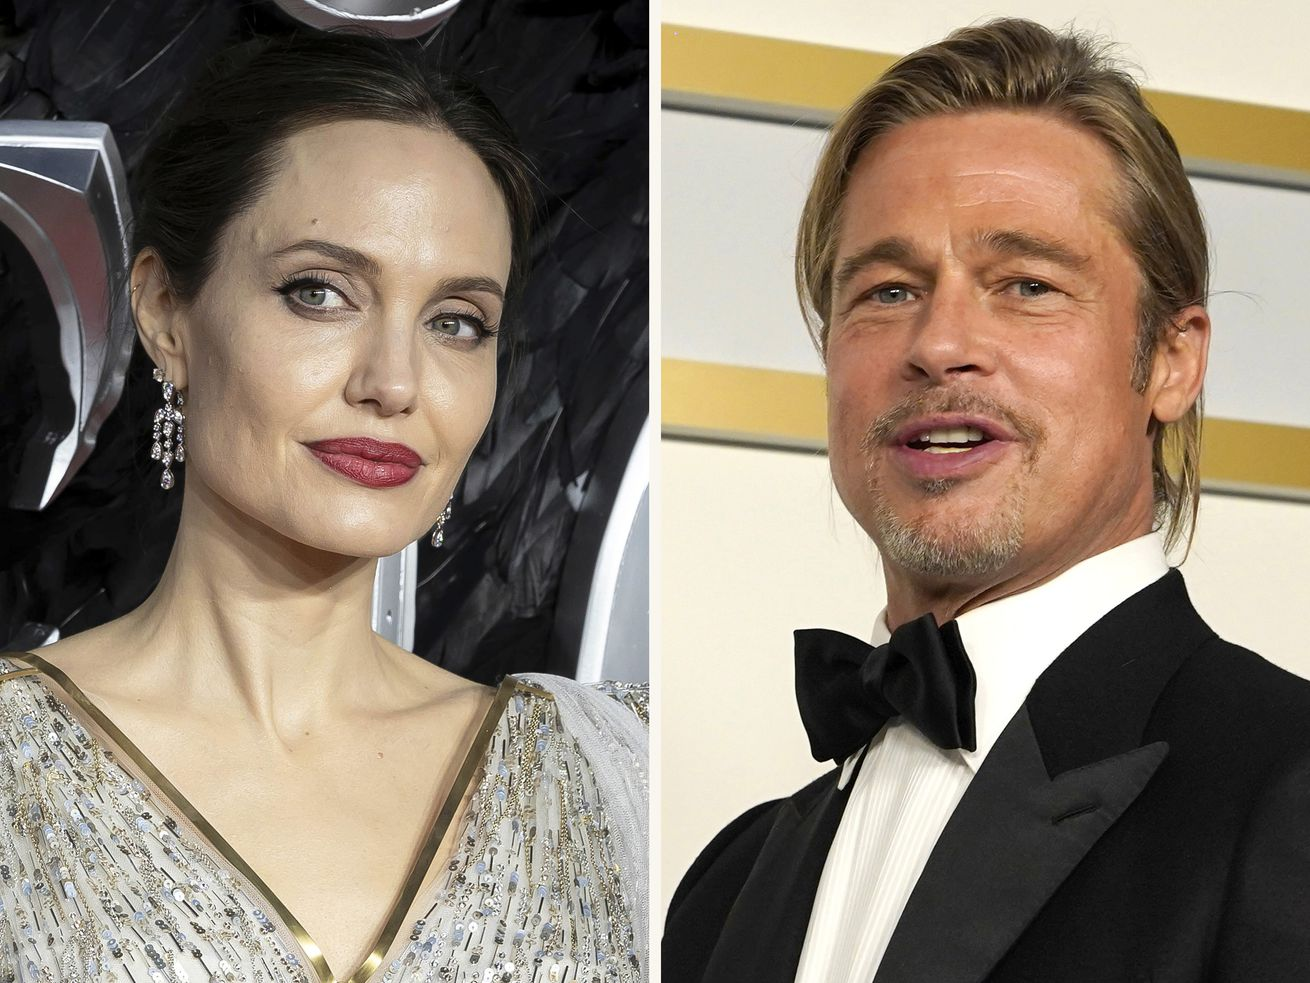 Private judge in Angelina Jolie-Brad Pitt divorce case disqualified